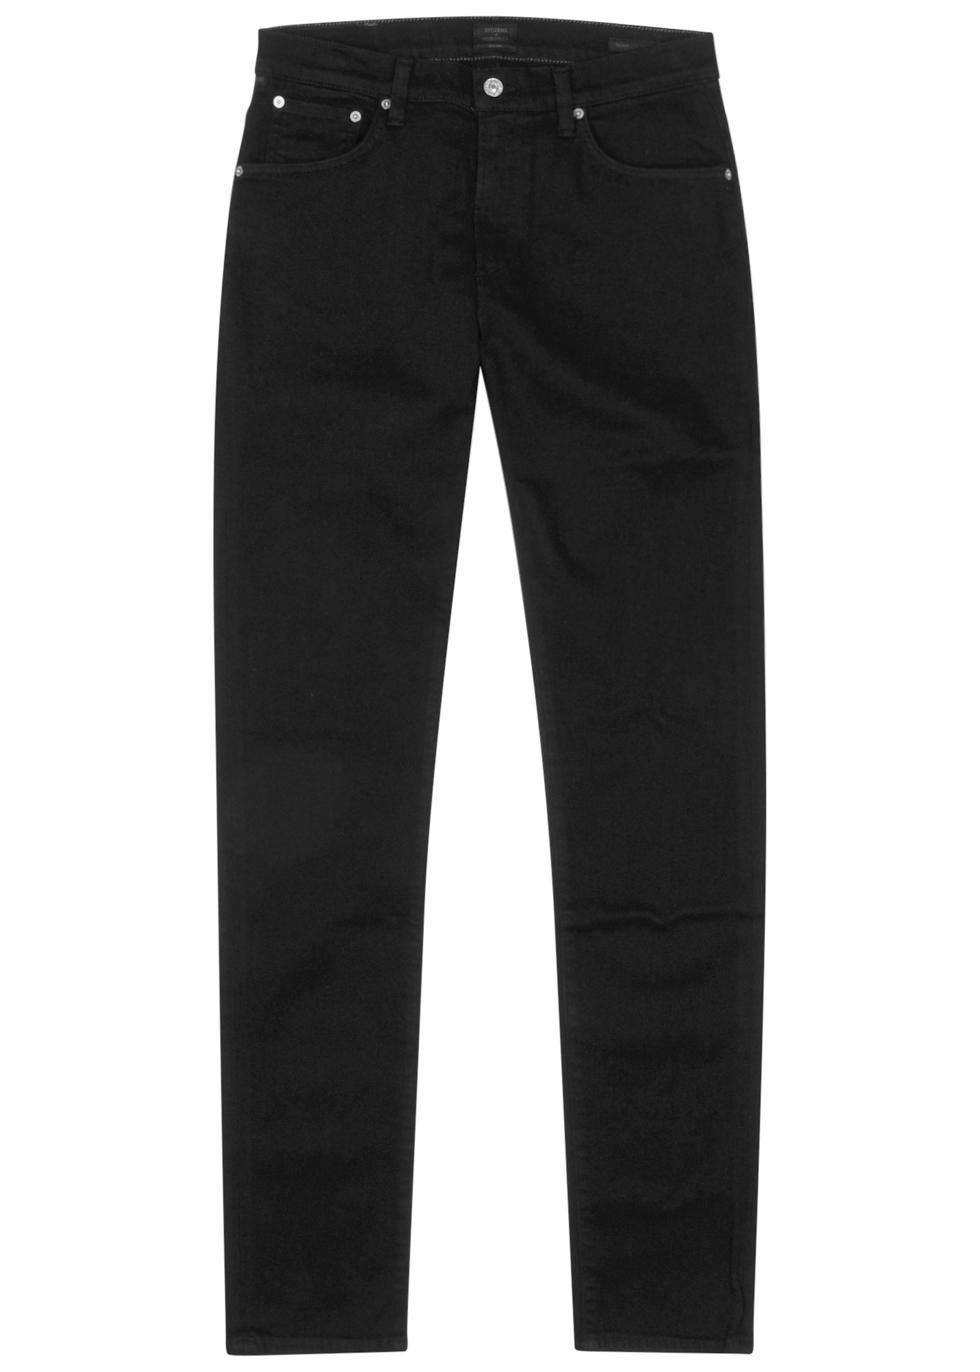 Noah black skinny jeans